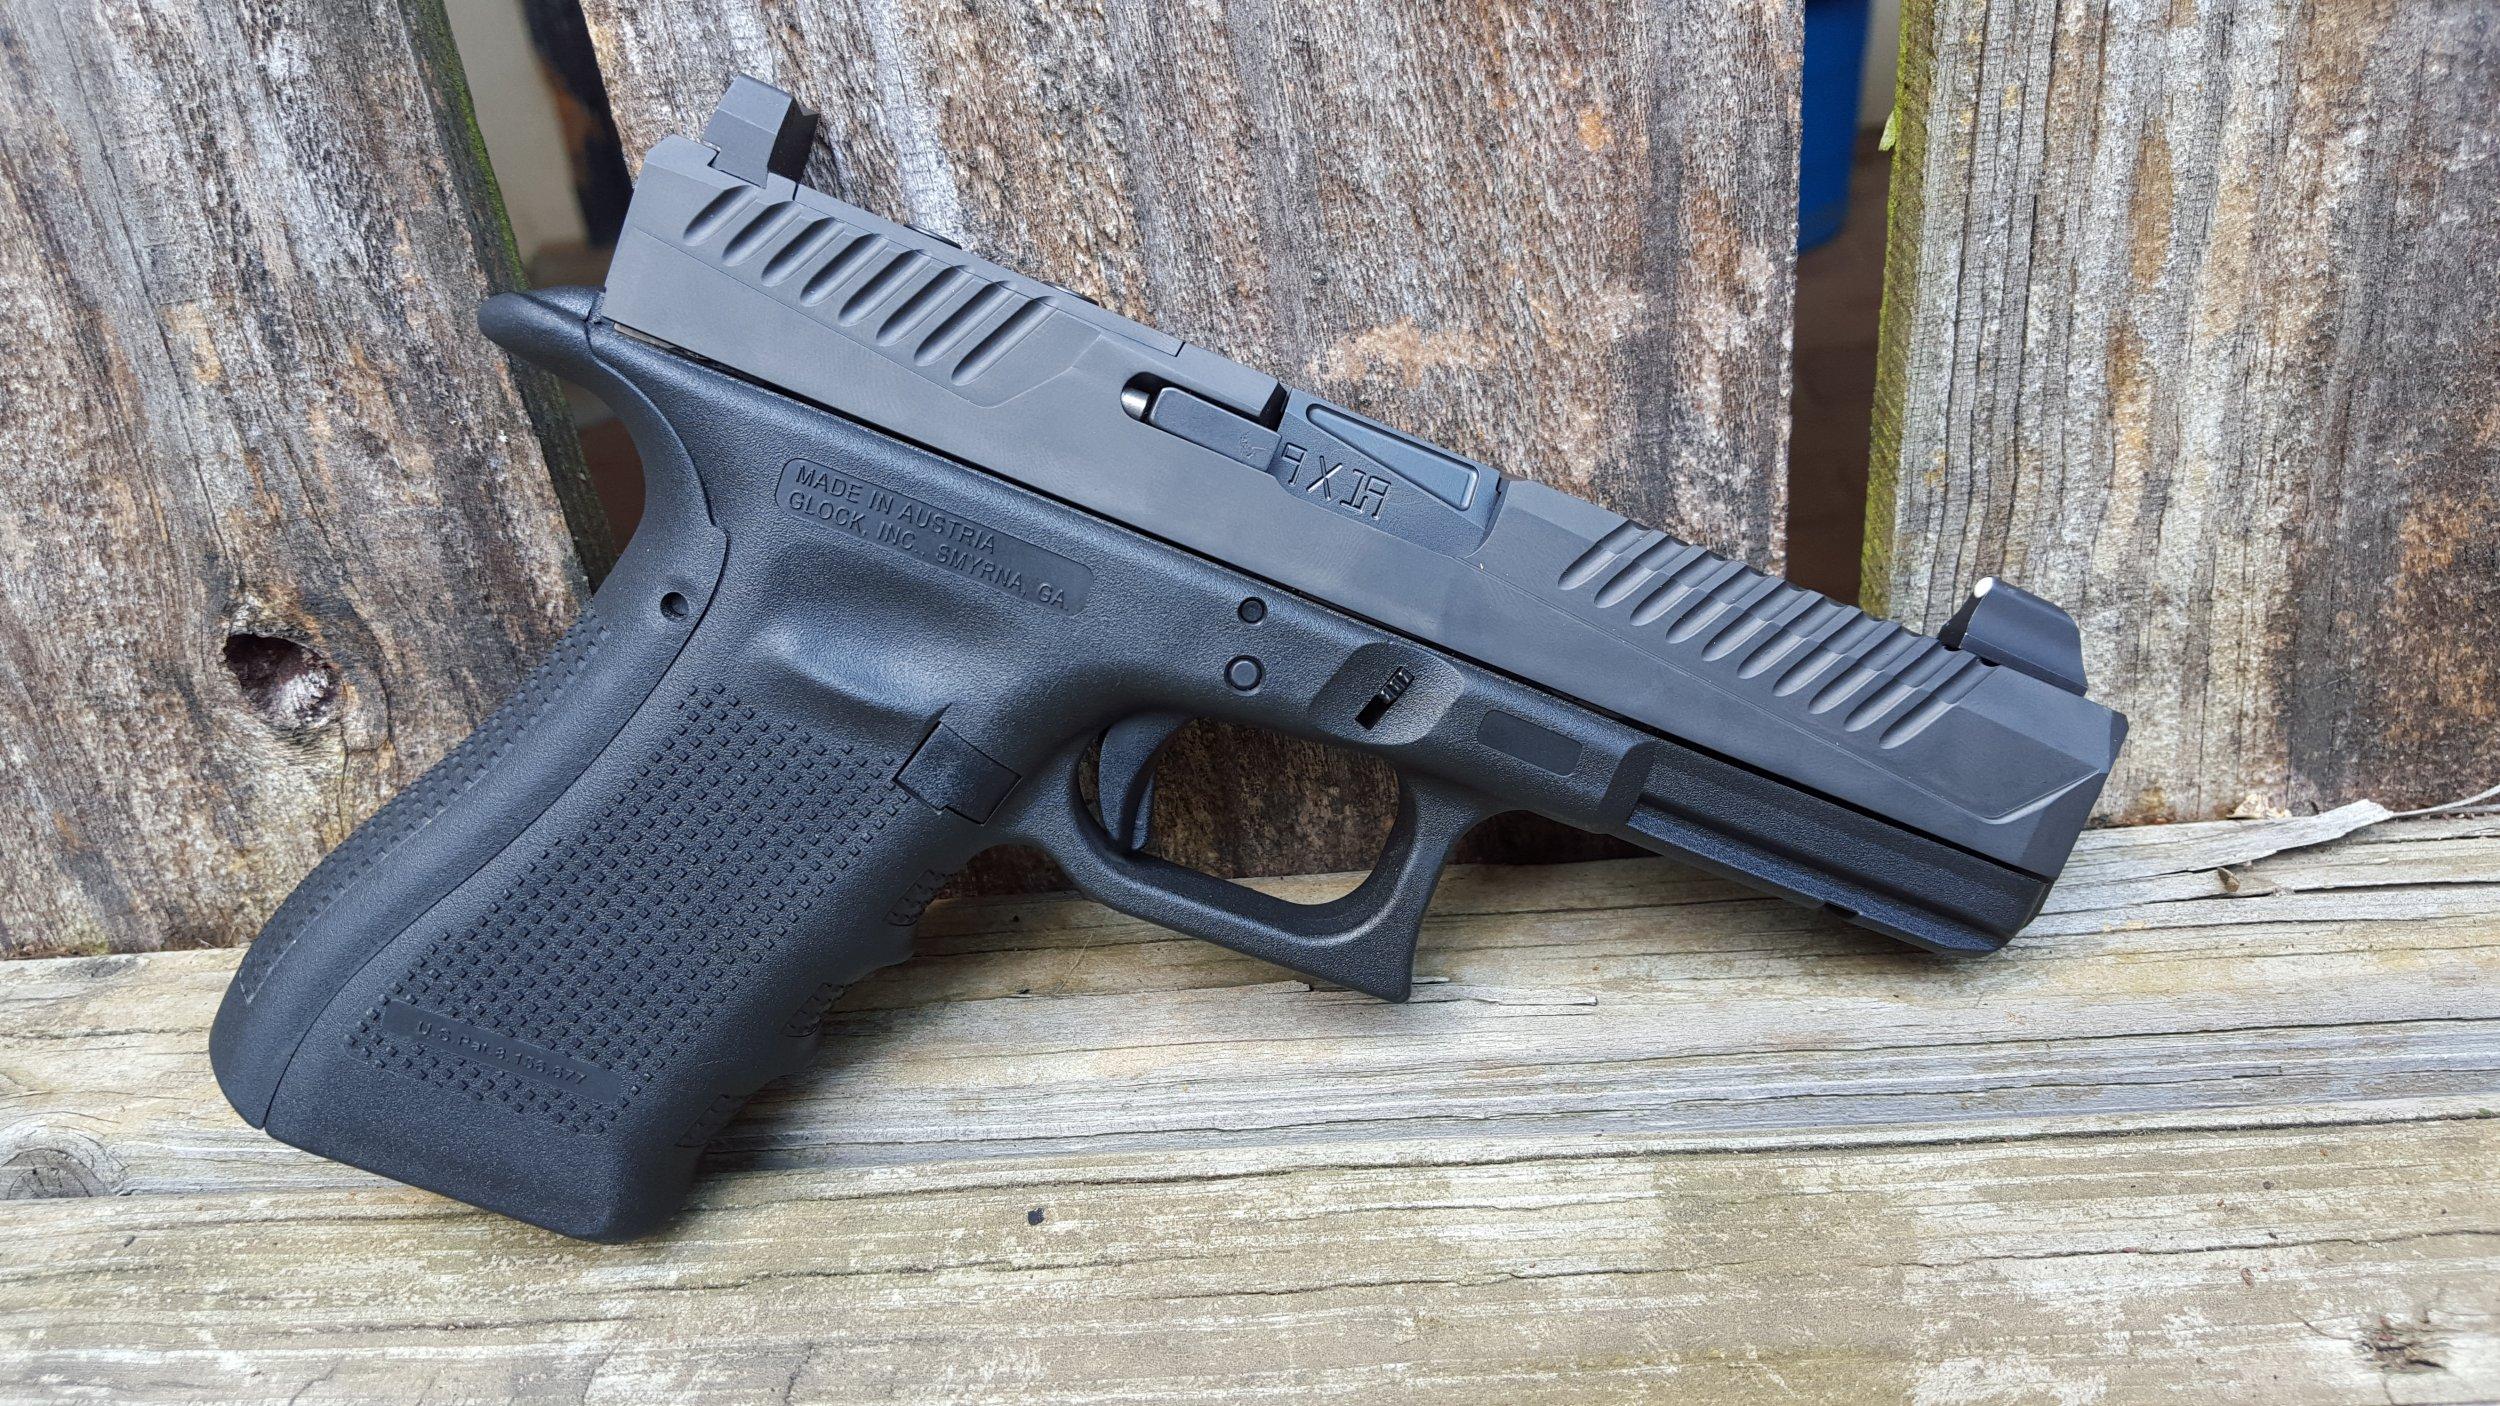 Jeff Gurwitch Runs the VooDoo Innovations VDI Enforcer Glock 17 (G17